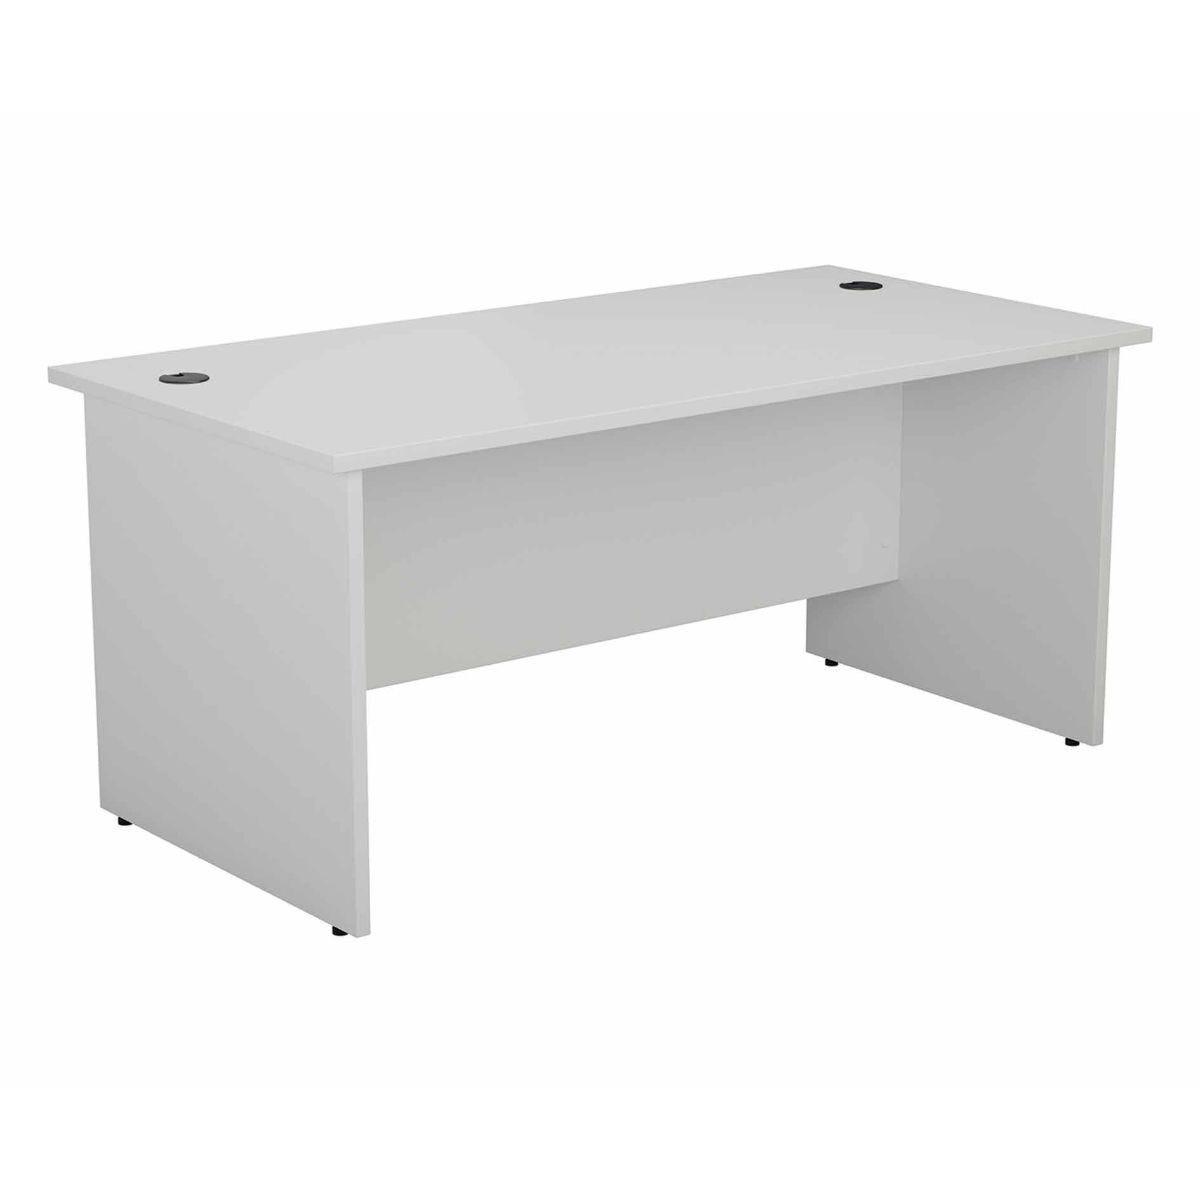 TC Office Rectangular Desk with Panel End Legs 1400 x 800mm White